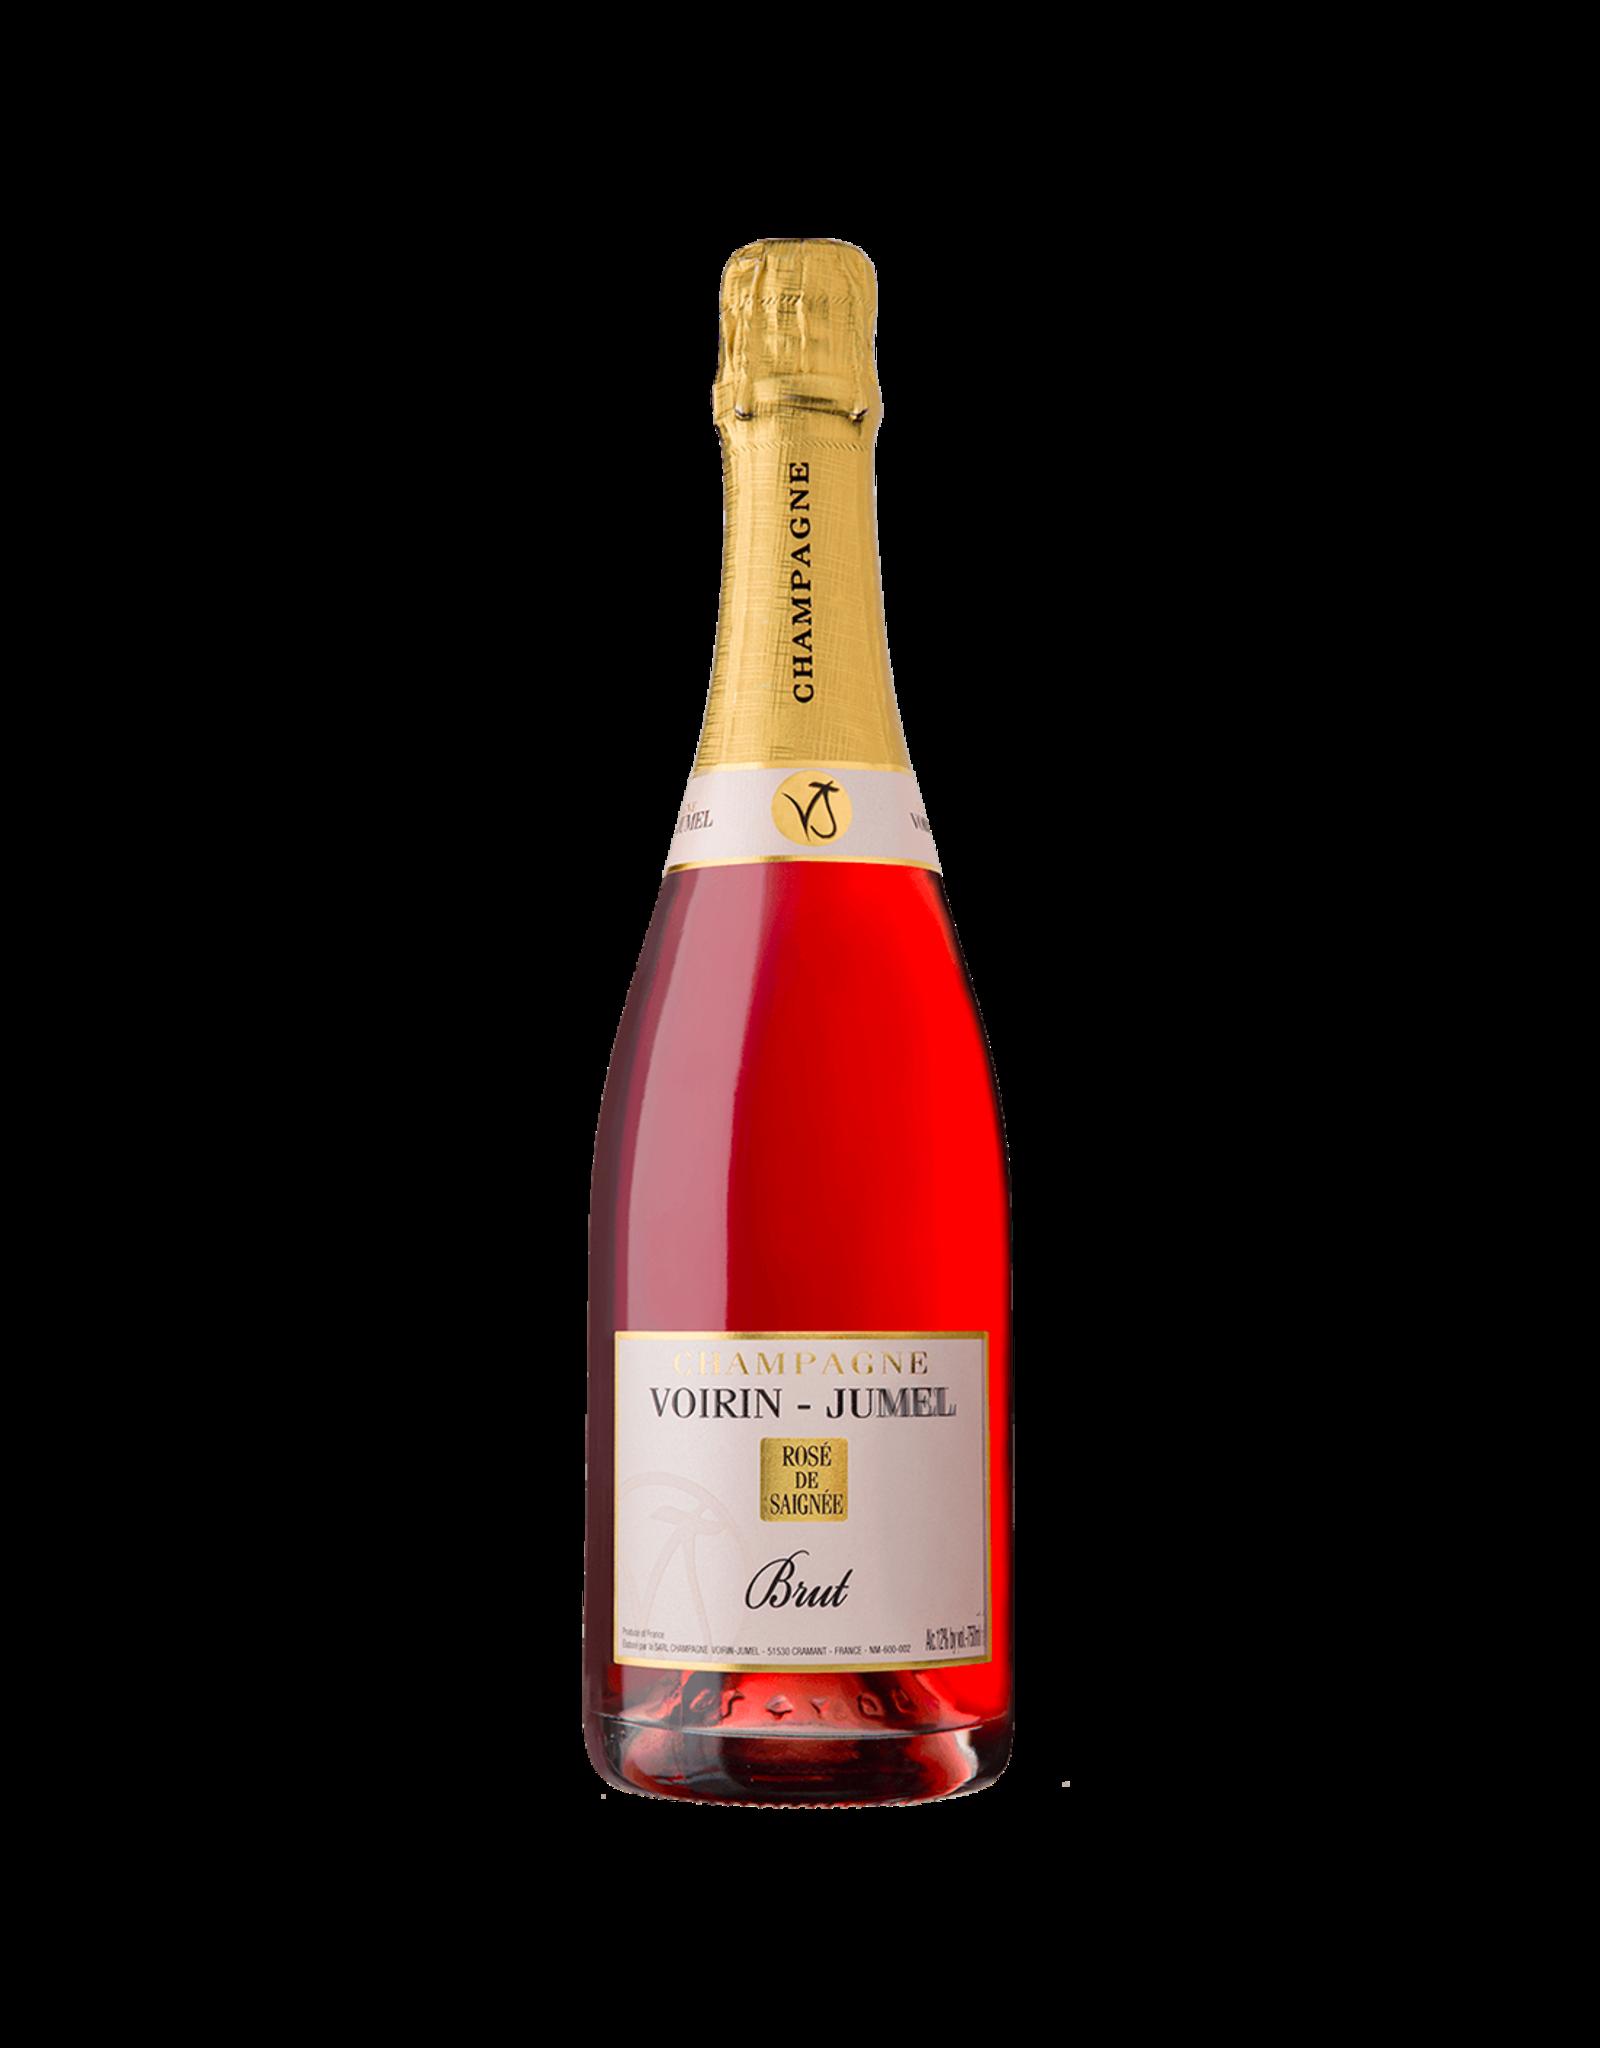 Voirin-Jumel Voirin-Jumel Champagne Rose de Saignee (N.V.)